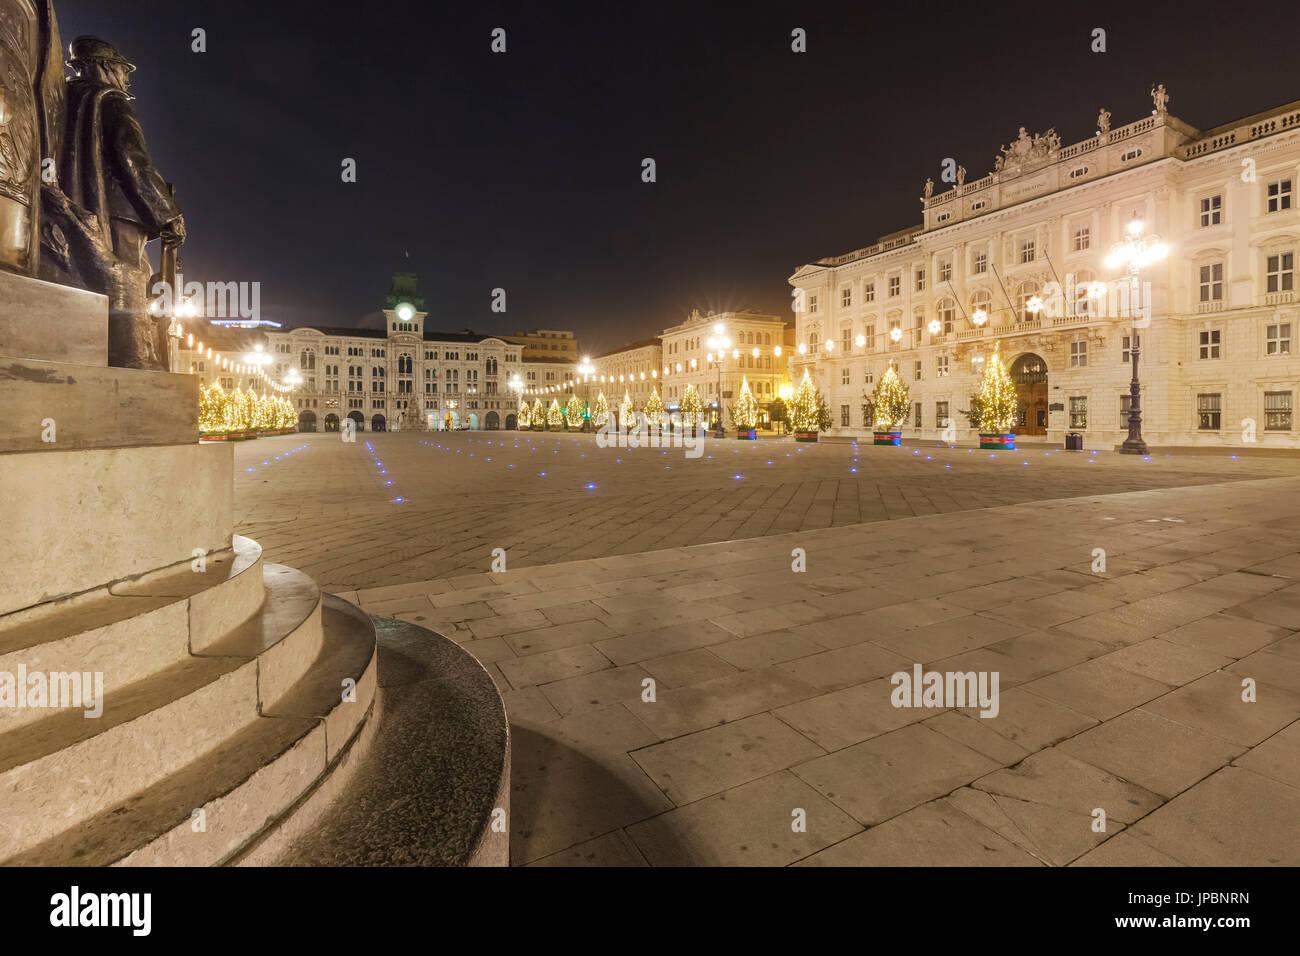 Trieste Natale Immagini.L Europa Italia Friuli Venezia Giulia Trieste Piazza Unita D